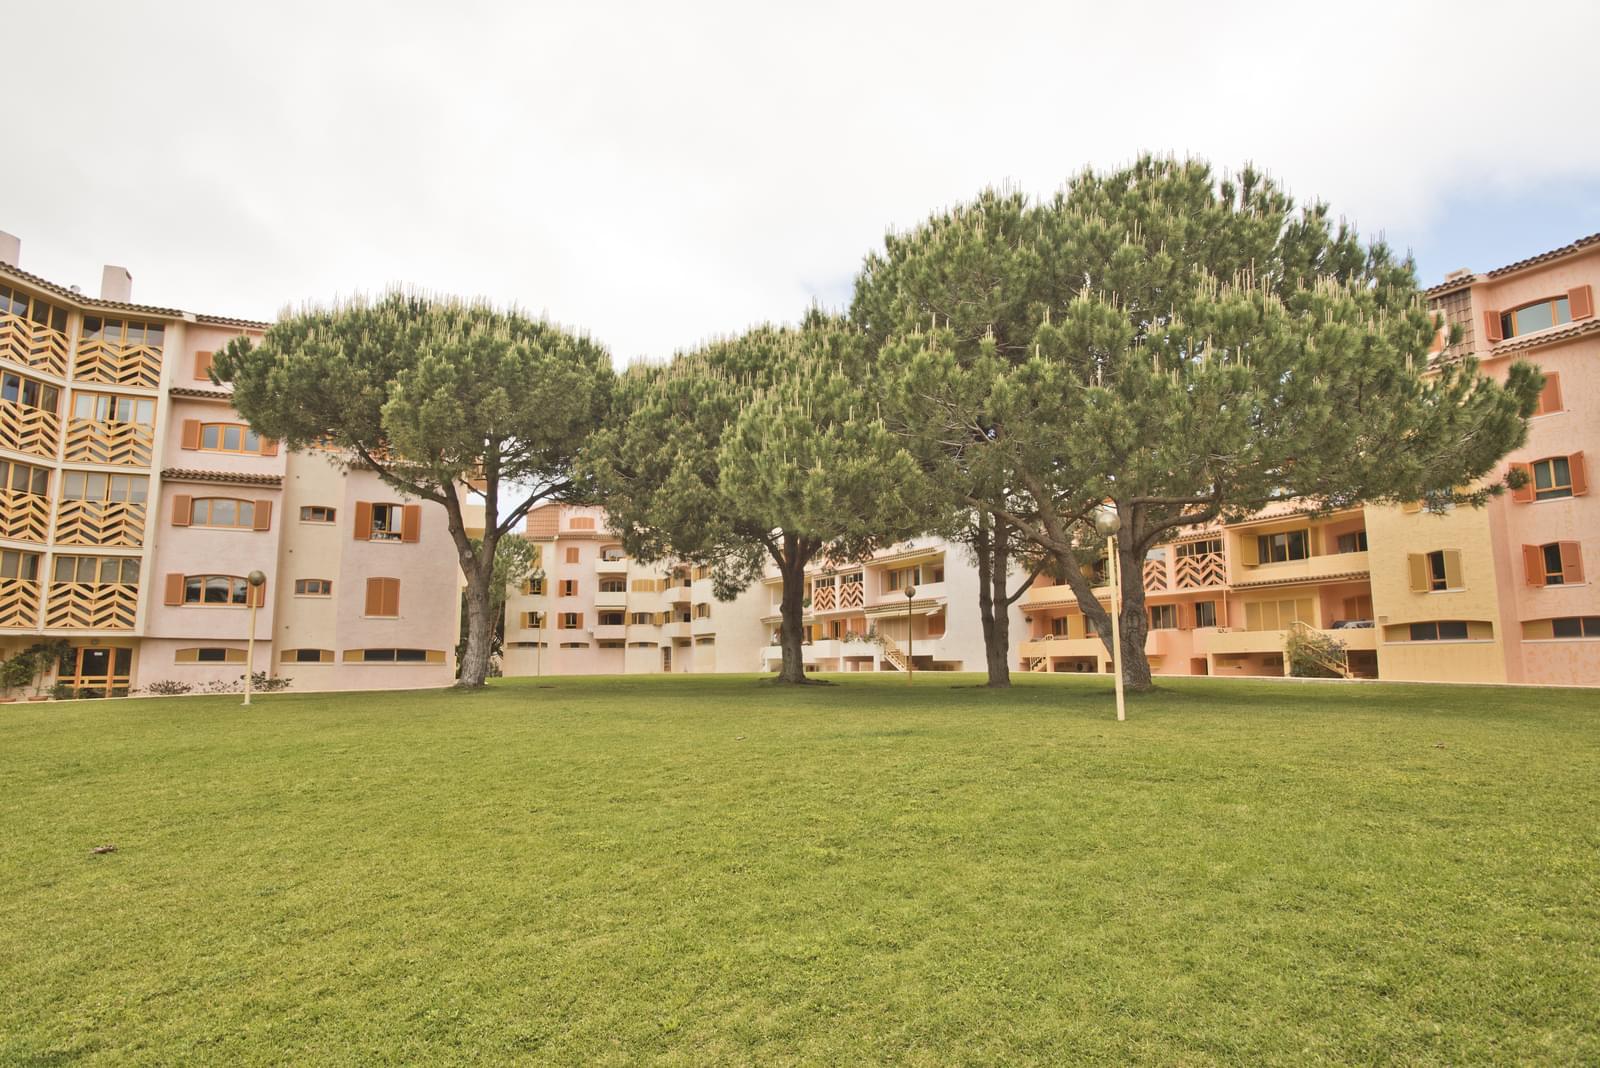 pf17156-apartamento-t3-cascais-99a664ed-d2c1-4b47-b875-5f6fb854cf3c